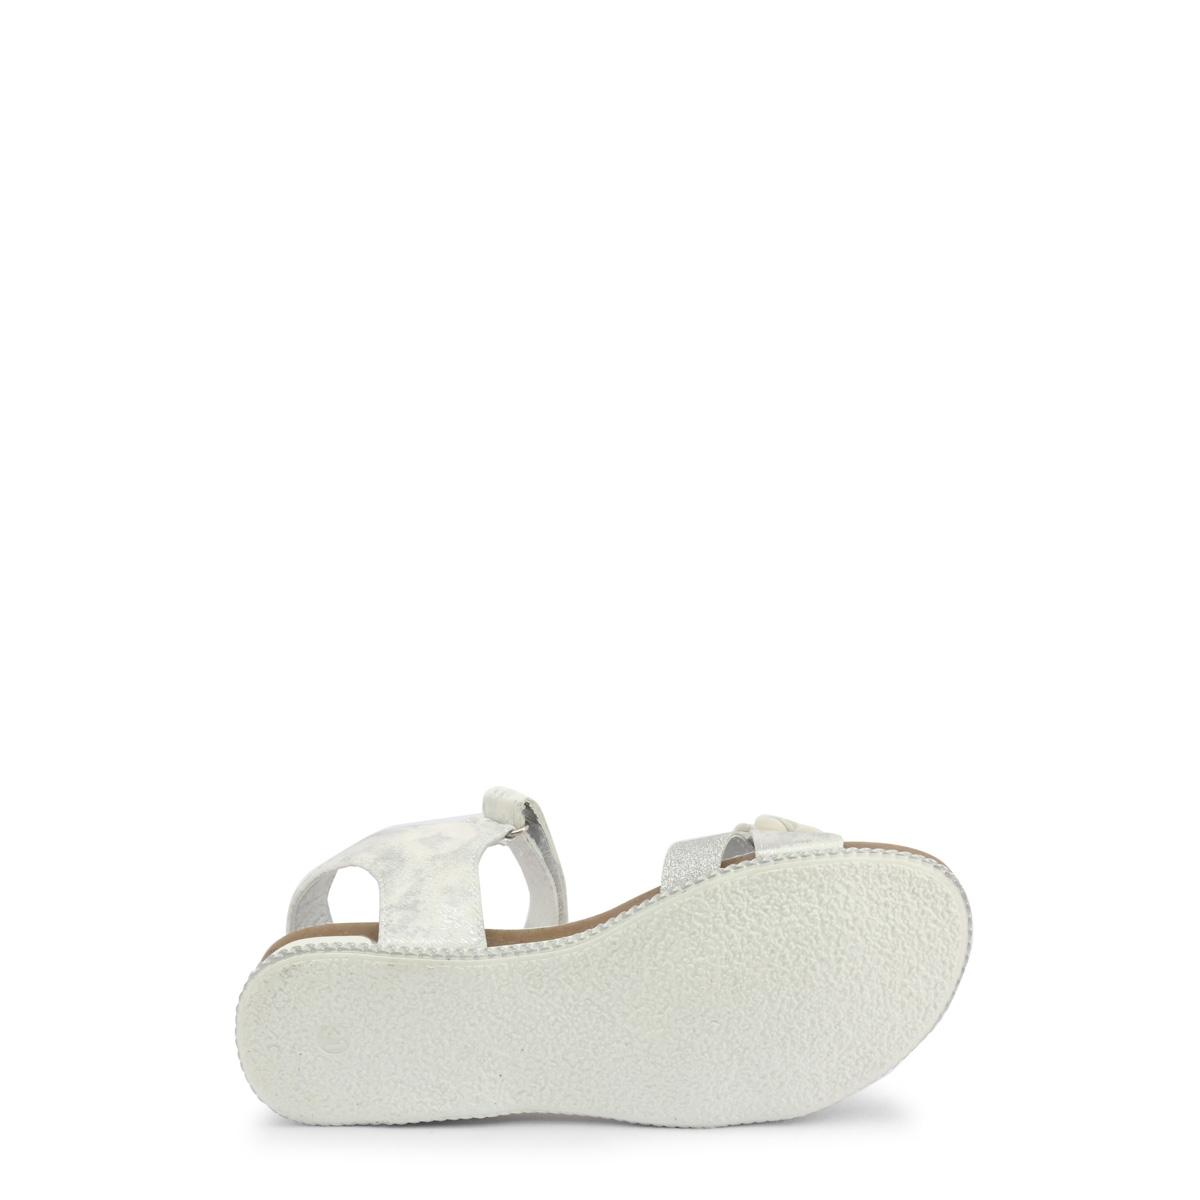 Sandale Shone L6133-036 Alb